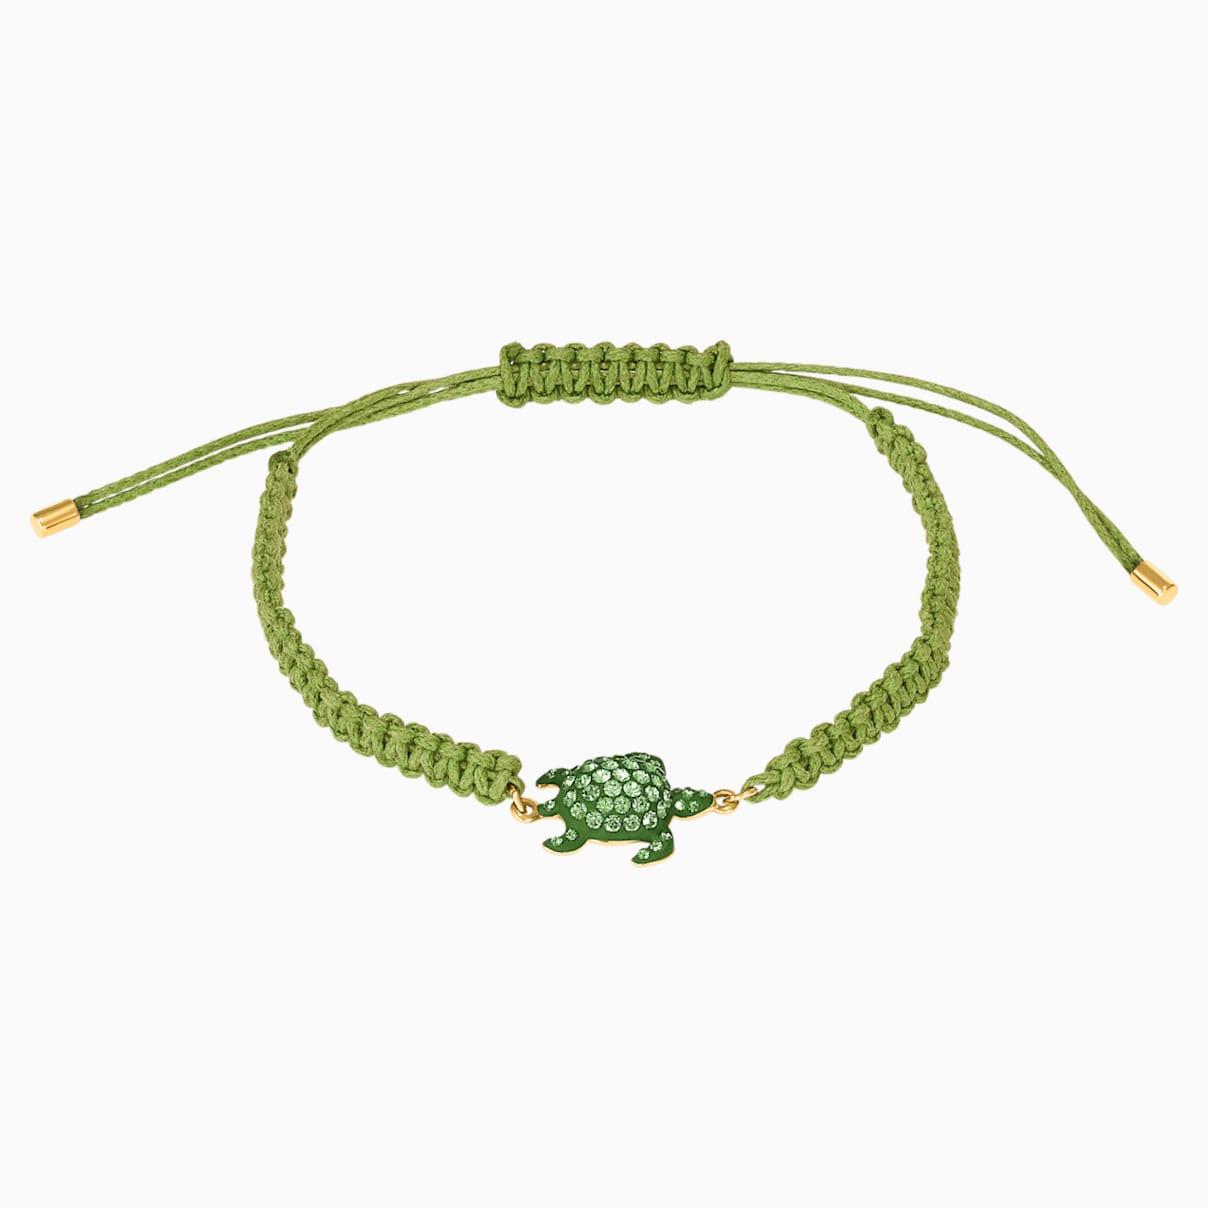 Swarovski Mustique Sea Life Turtle Bracelet, Green, Gold-tone plated